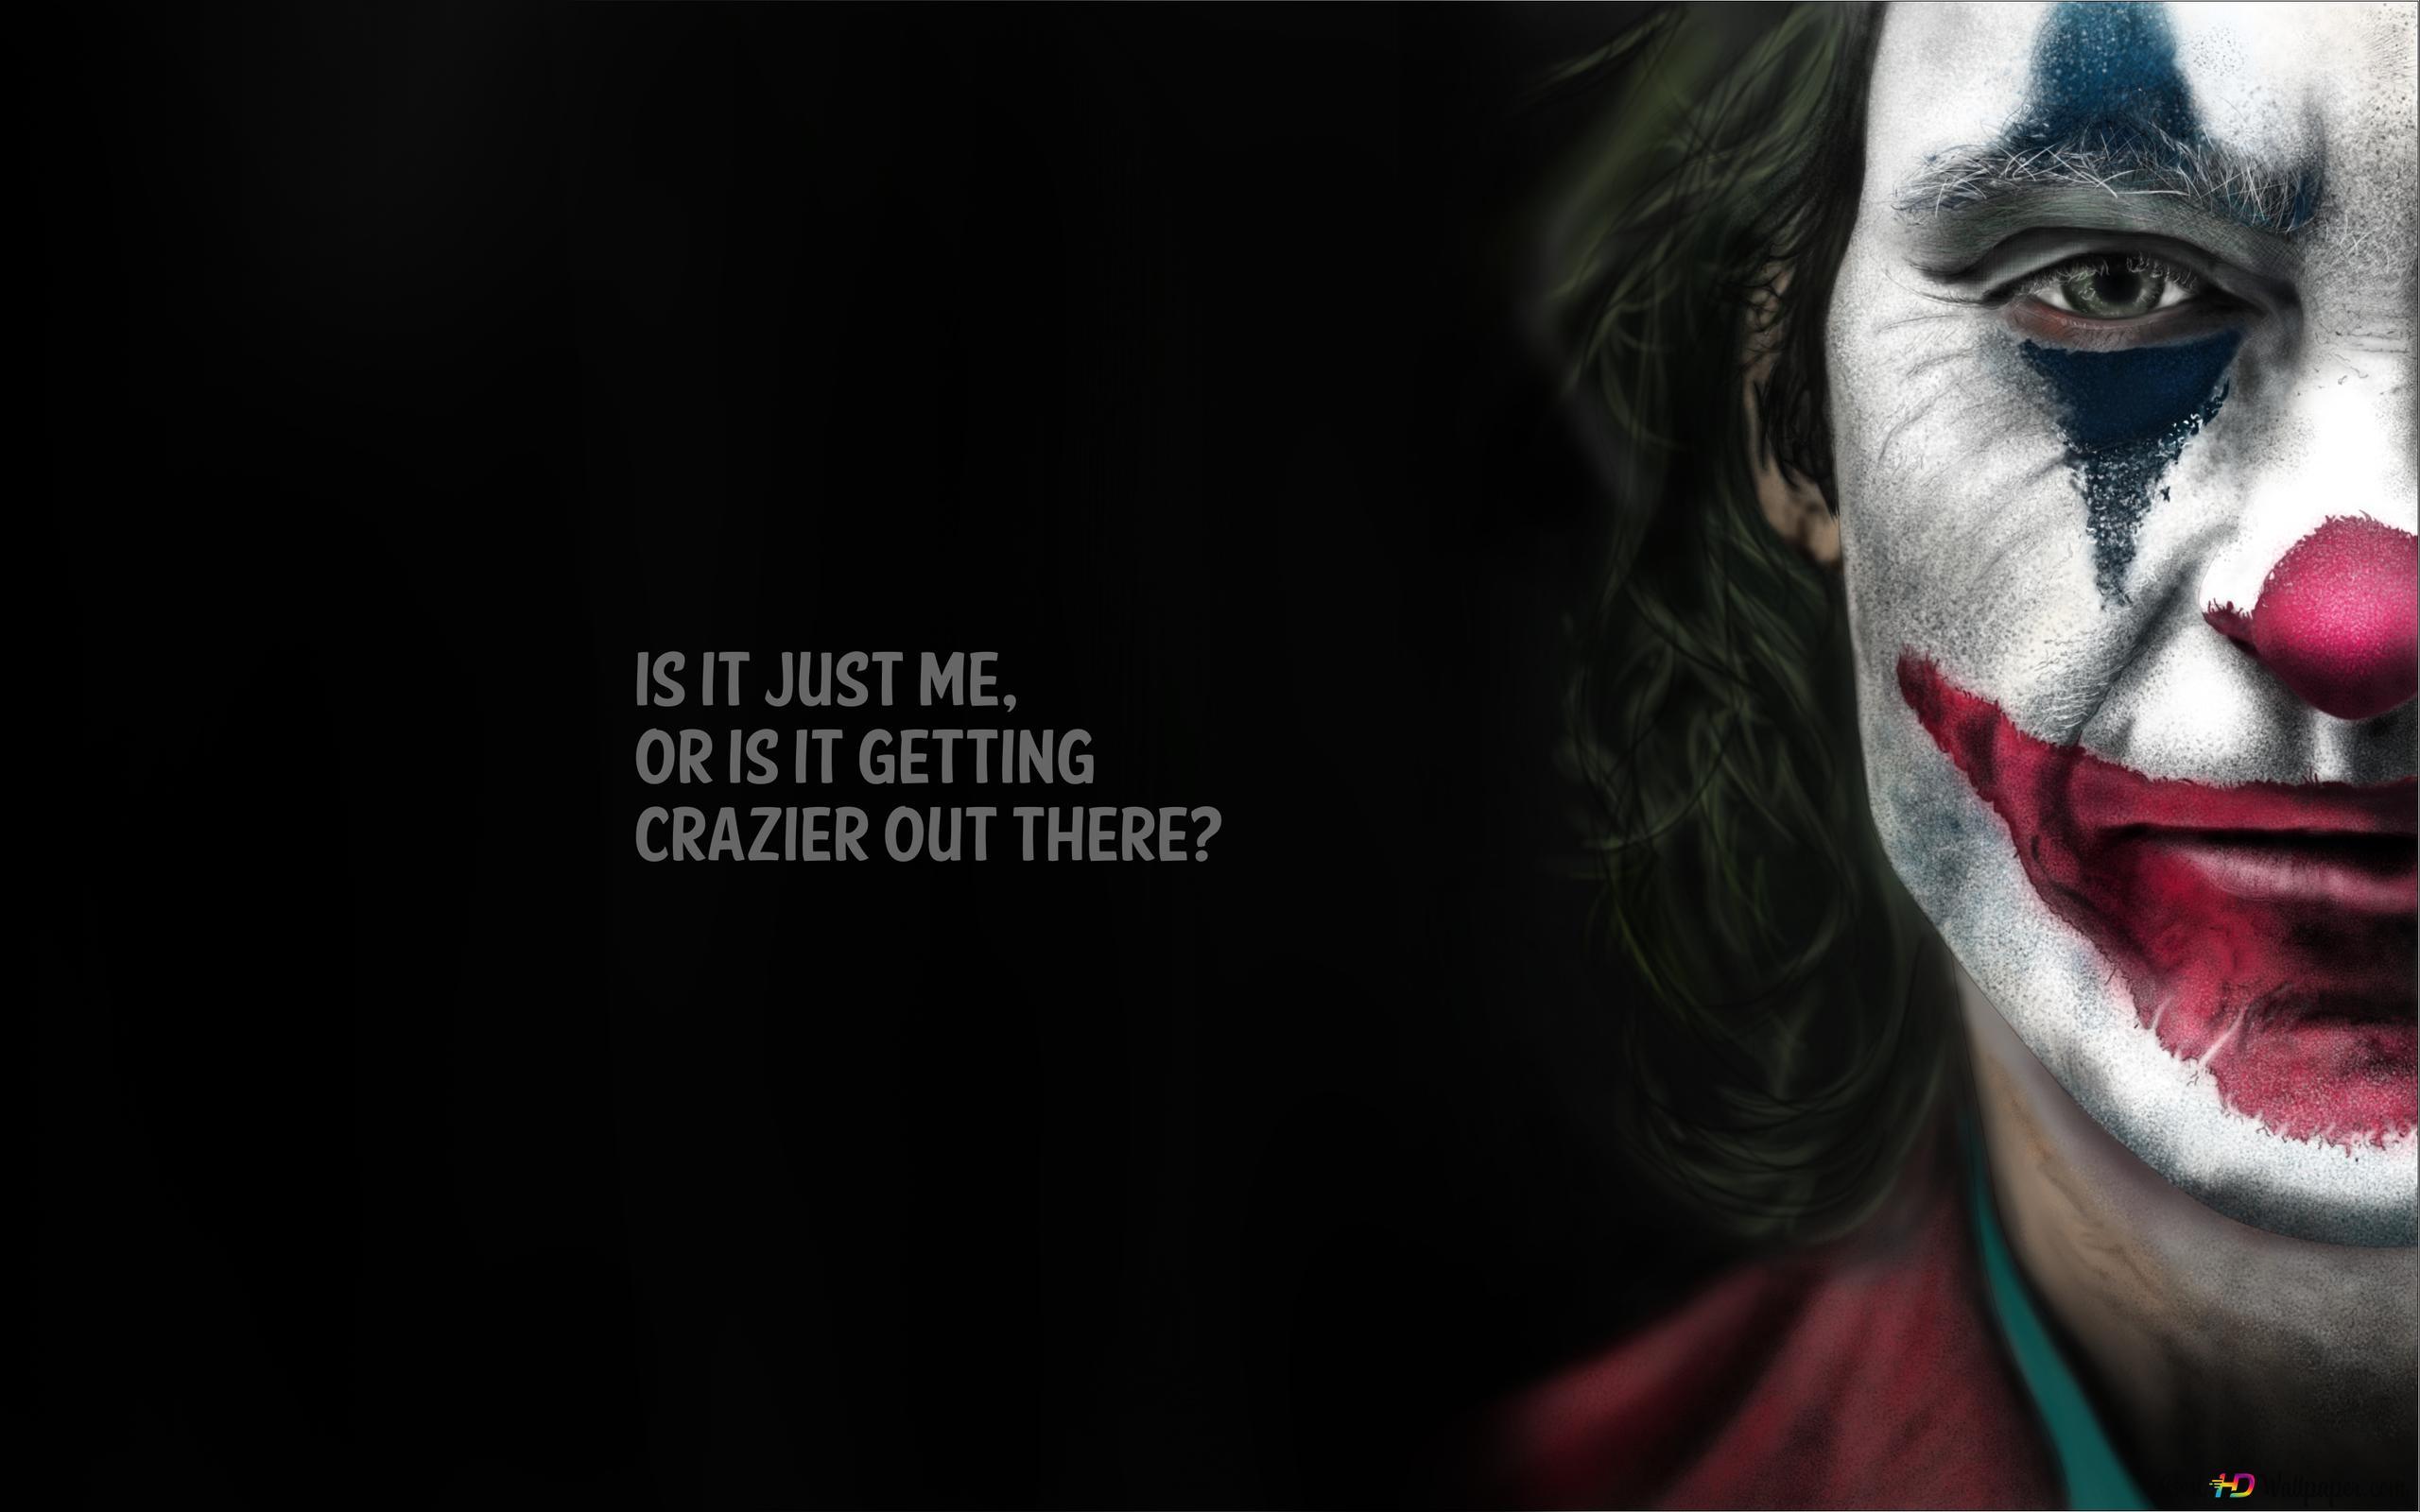 Joker Minimalista Wallpaper 4k Hd Wallpaper Download